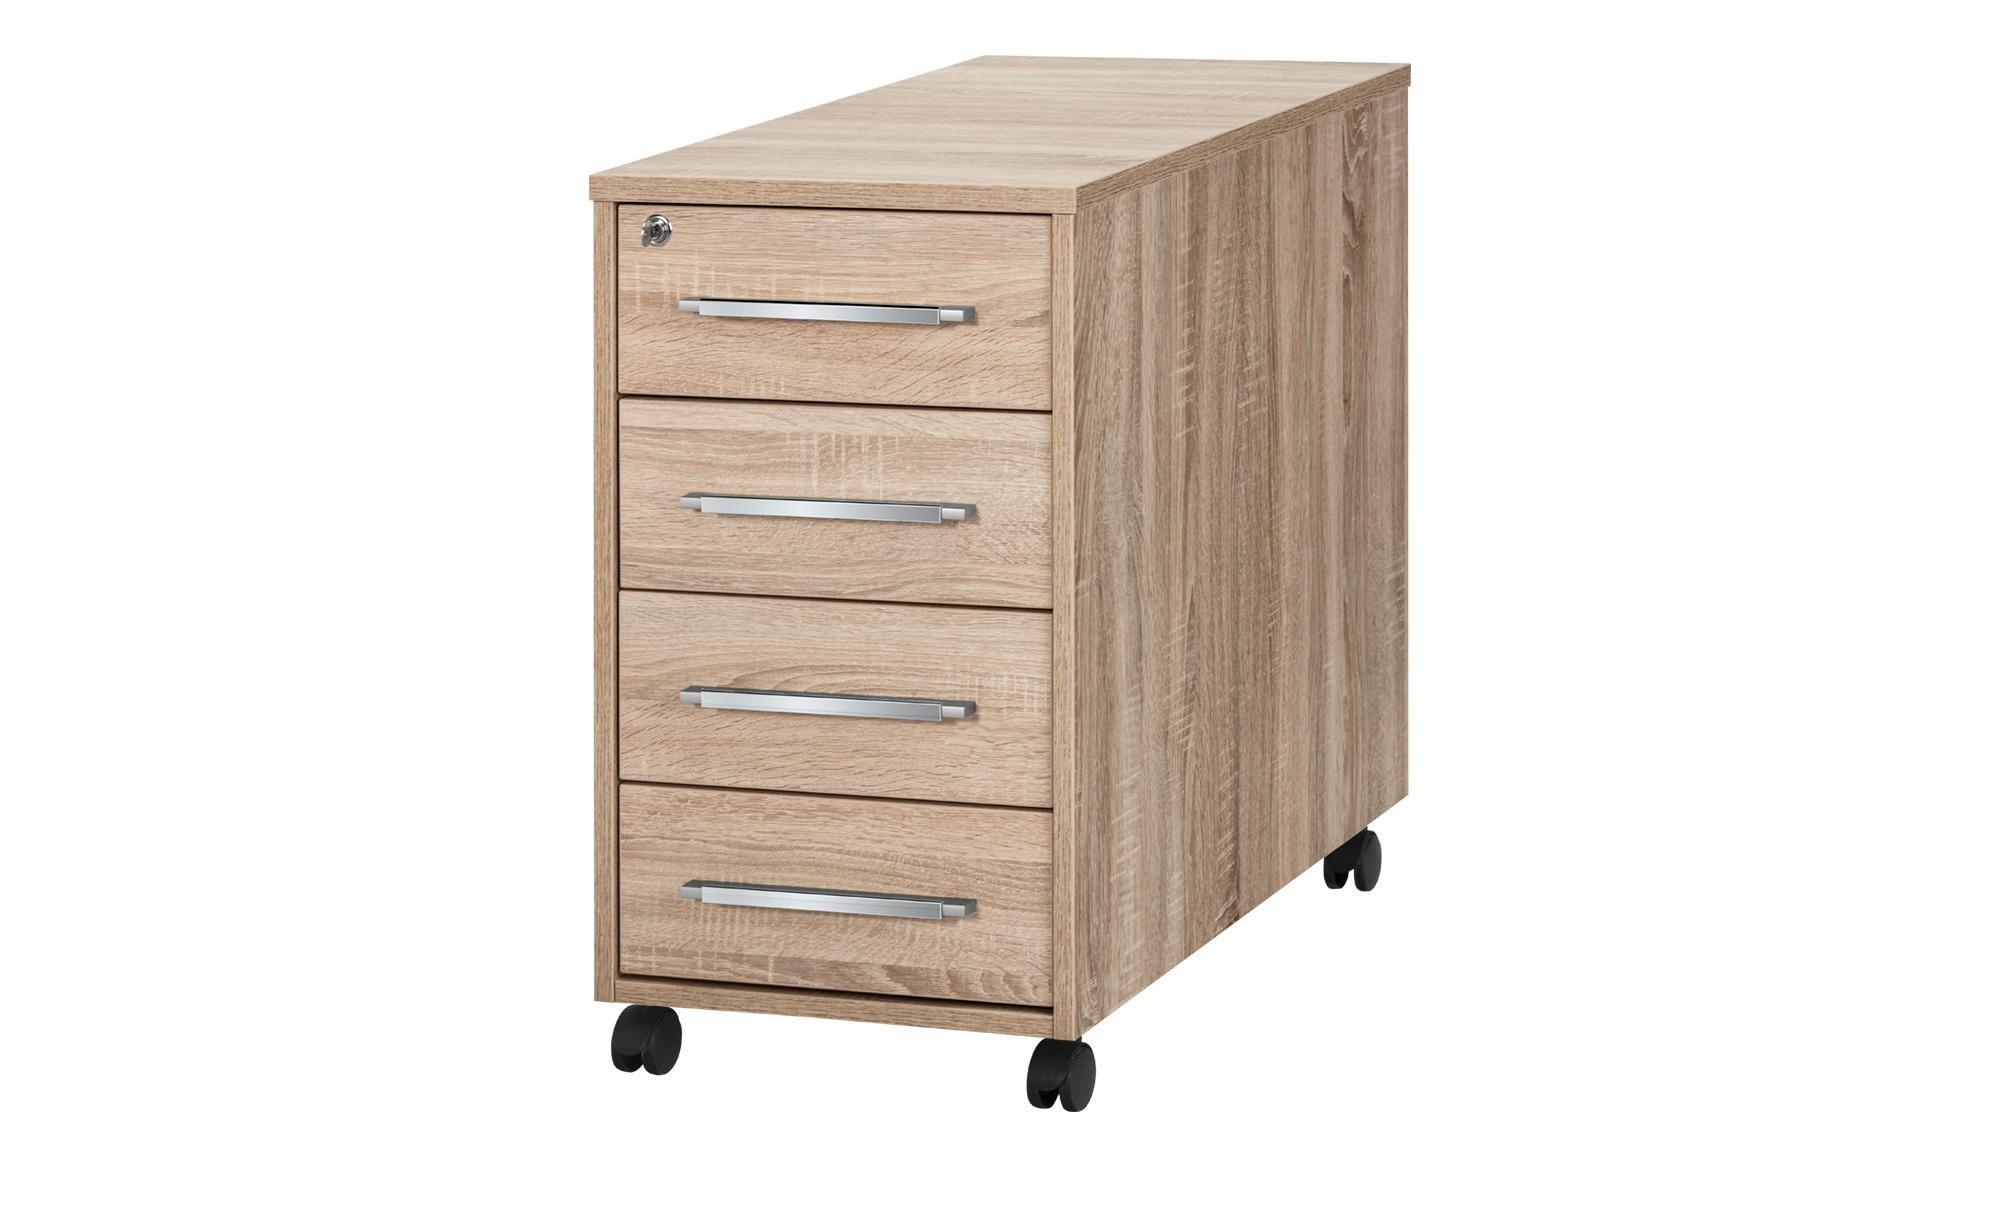 Rollcontainer - holzfarben - 43 cm - 75 cm - 80 cm - Sconto | Büro > Büroschränke > Rollcontainer | Sconto